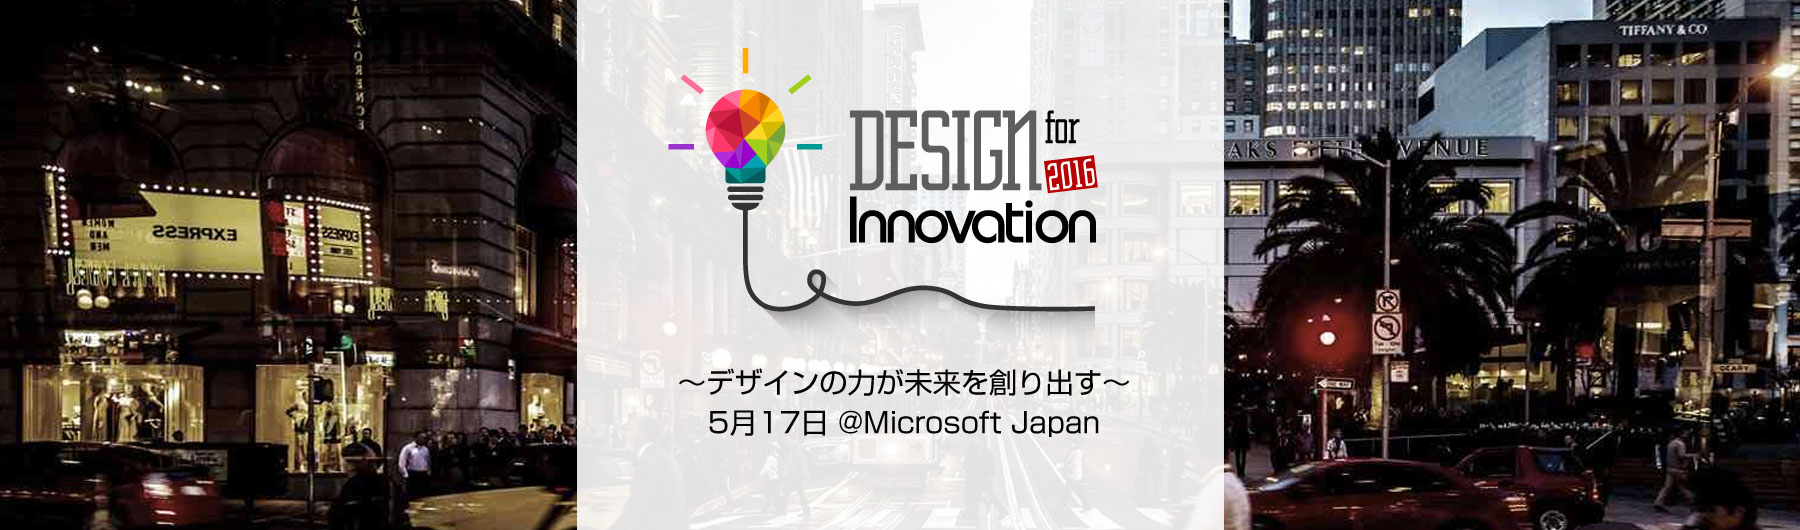 DESIGN for Innovation 2016